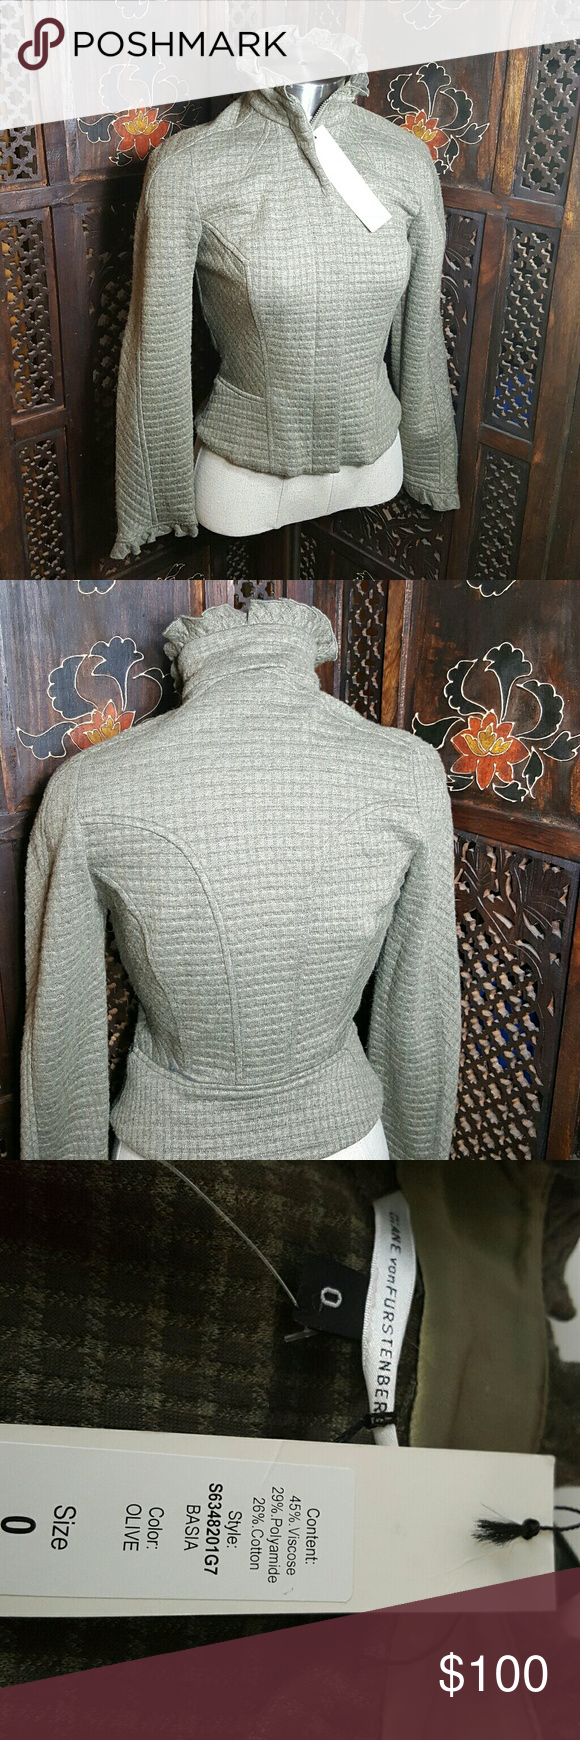 Selling this Gorgeous Diane Von Furstenberg Statement jacket on Poshmark! My username is: michelad. #shopmycloset #poshmark #fashion #shopping #style #forsale #Diane von Furstenberg #Jackets & Blazers